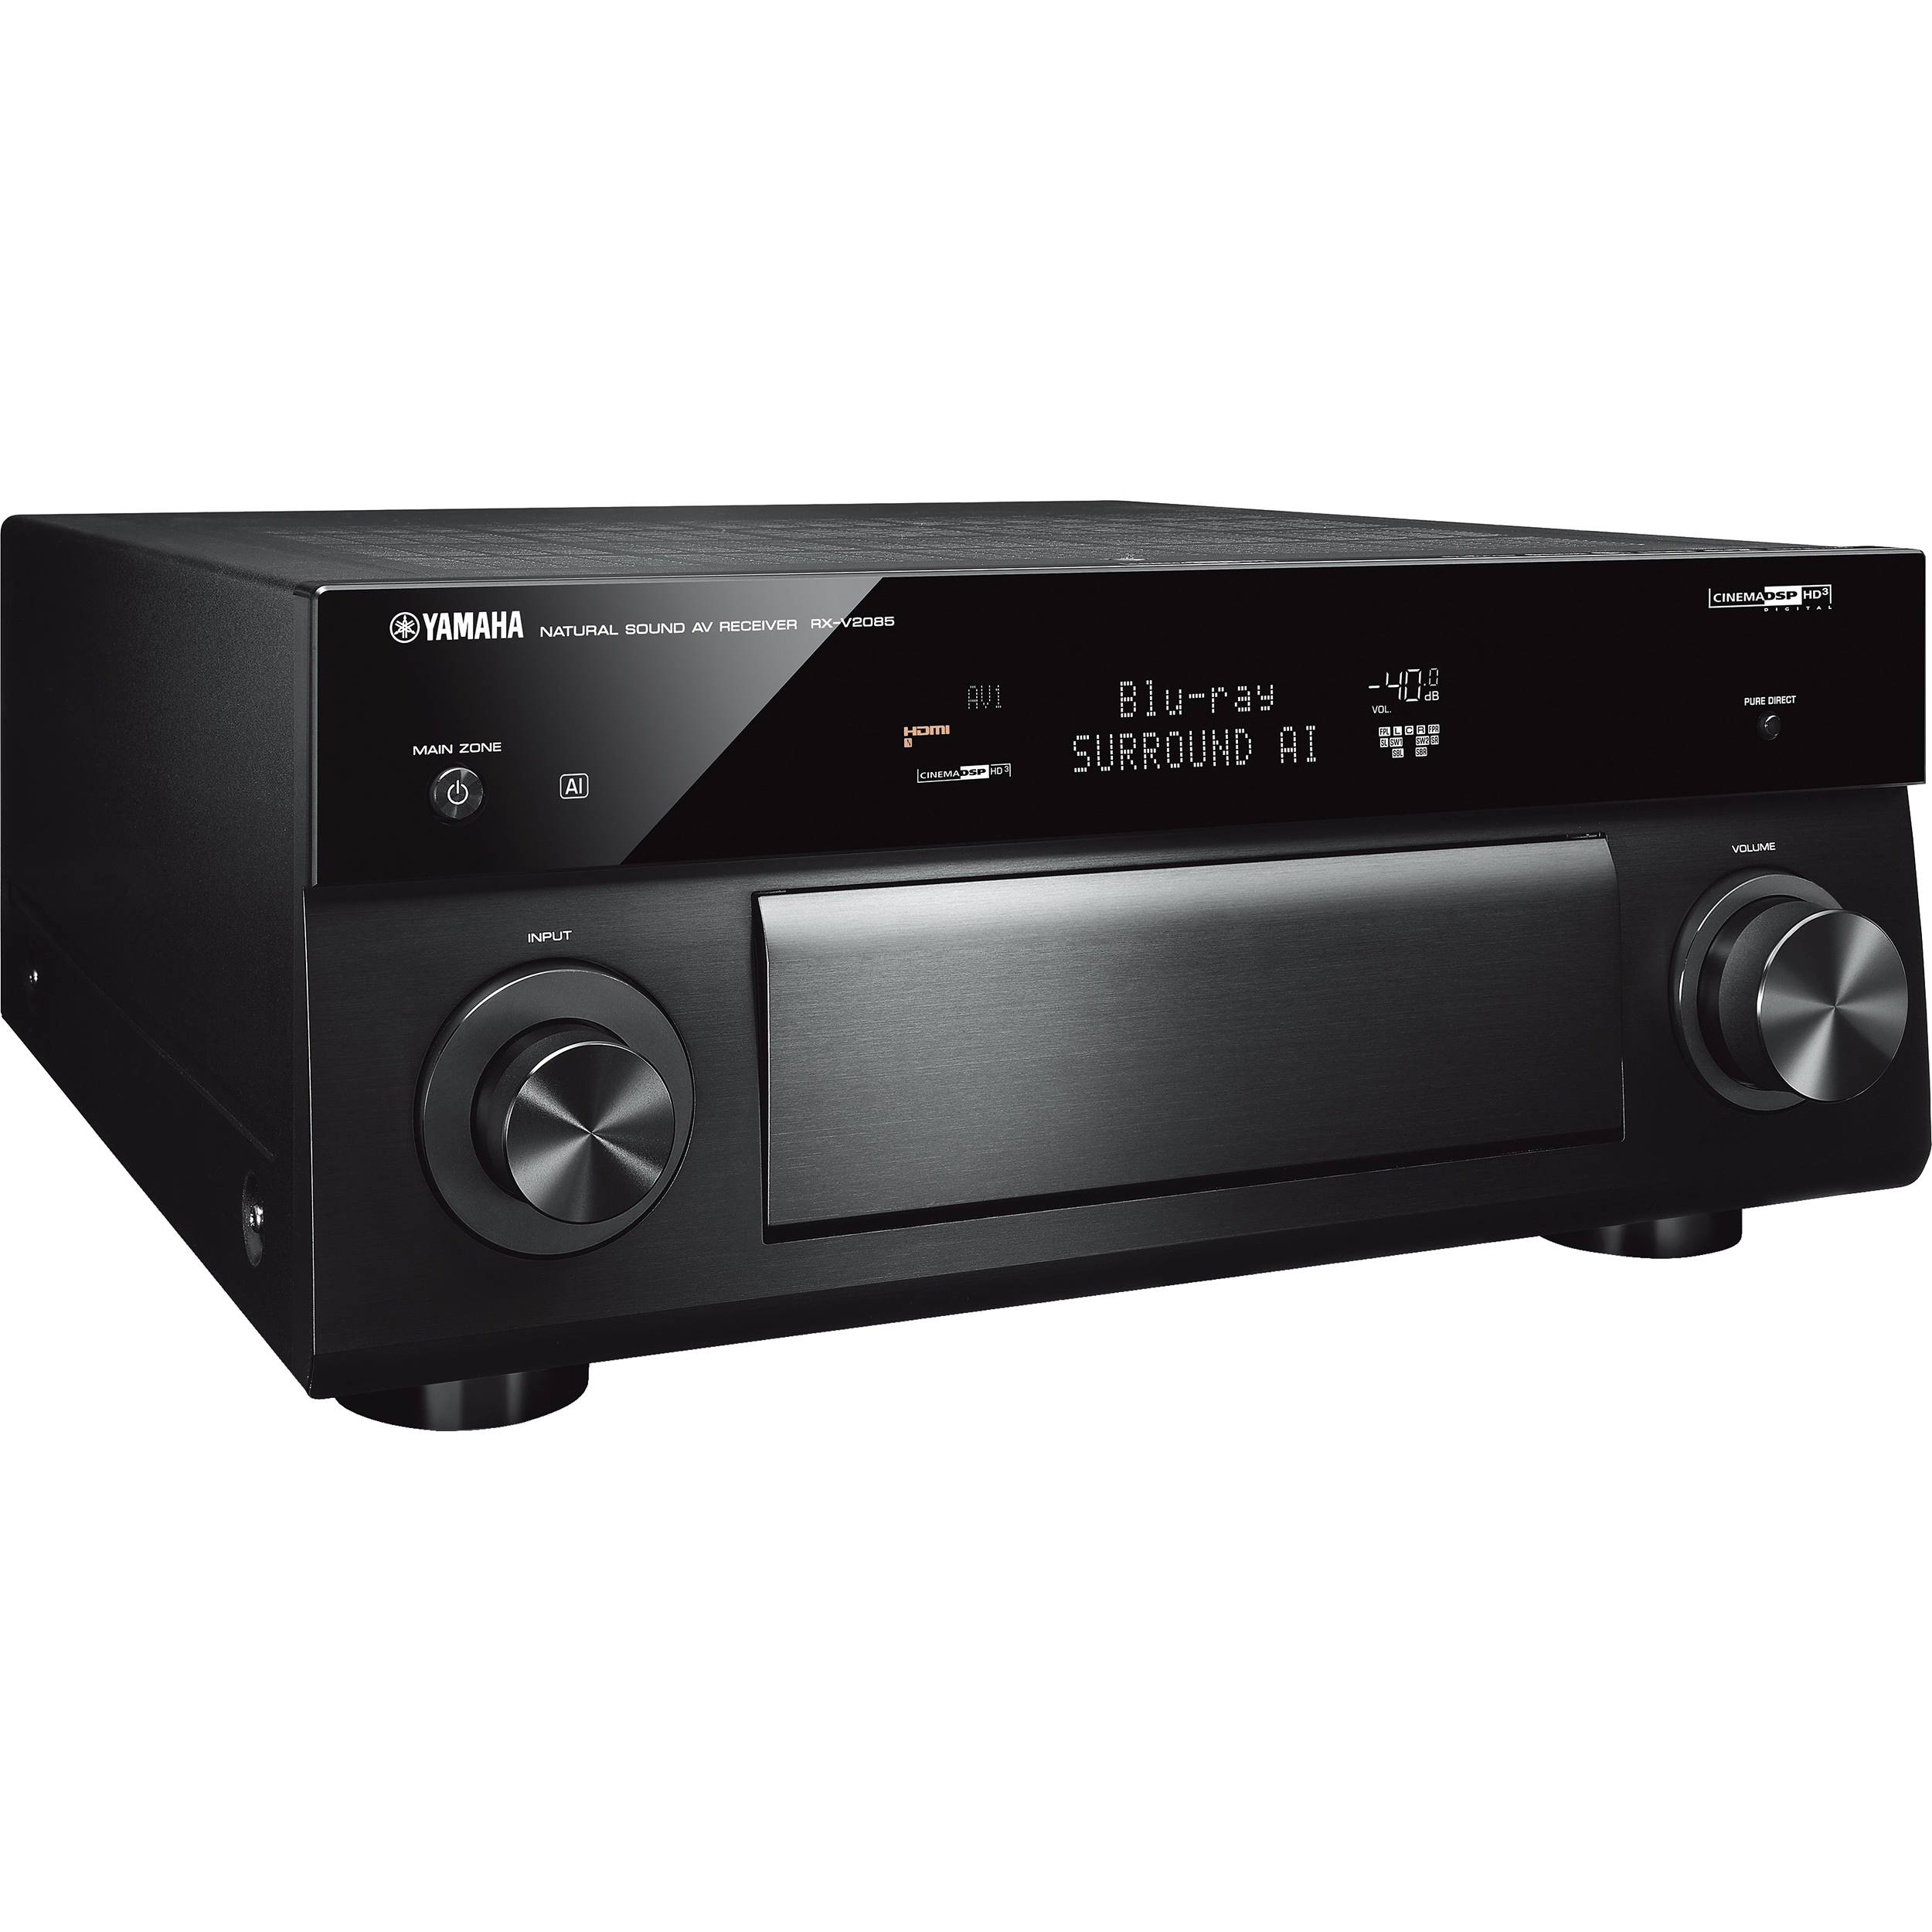 Yamaha RX-V2085 9 2-Channel Network A/V Receiver